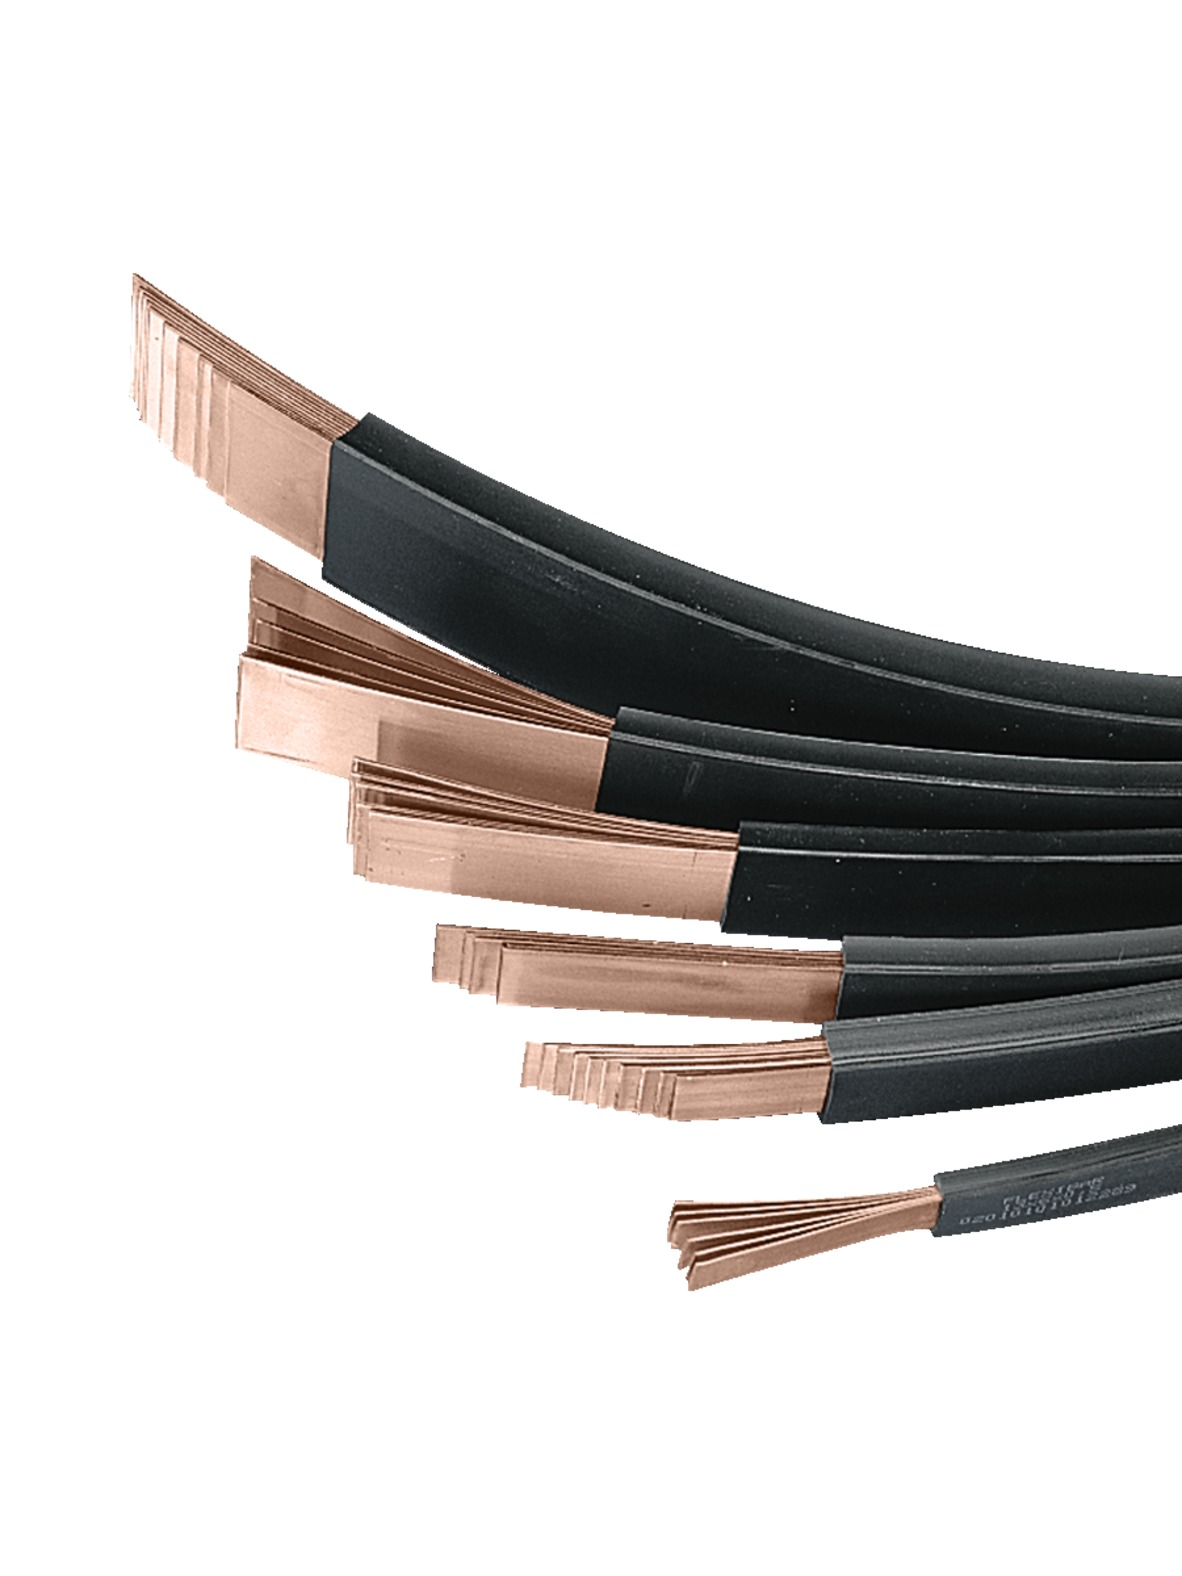 Rittal sv3568.000 Copper Bar 6 x 15,5 x 0,8 Length 80cm